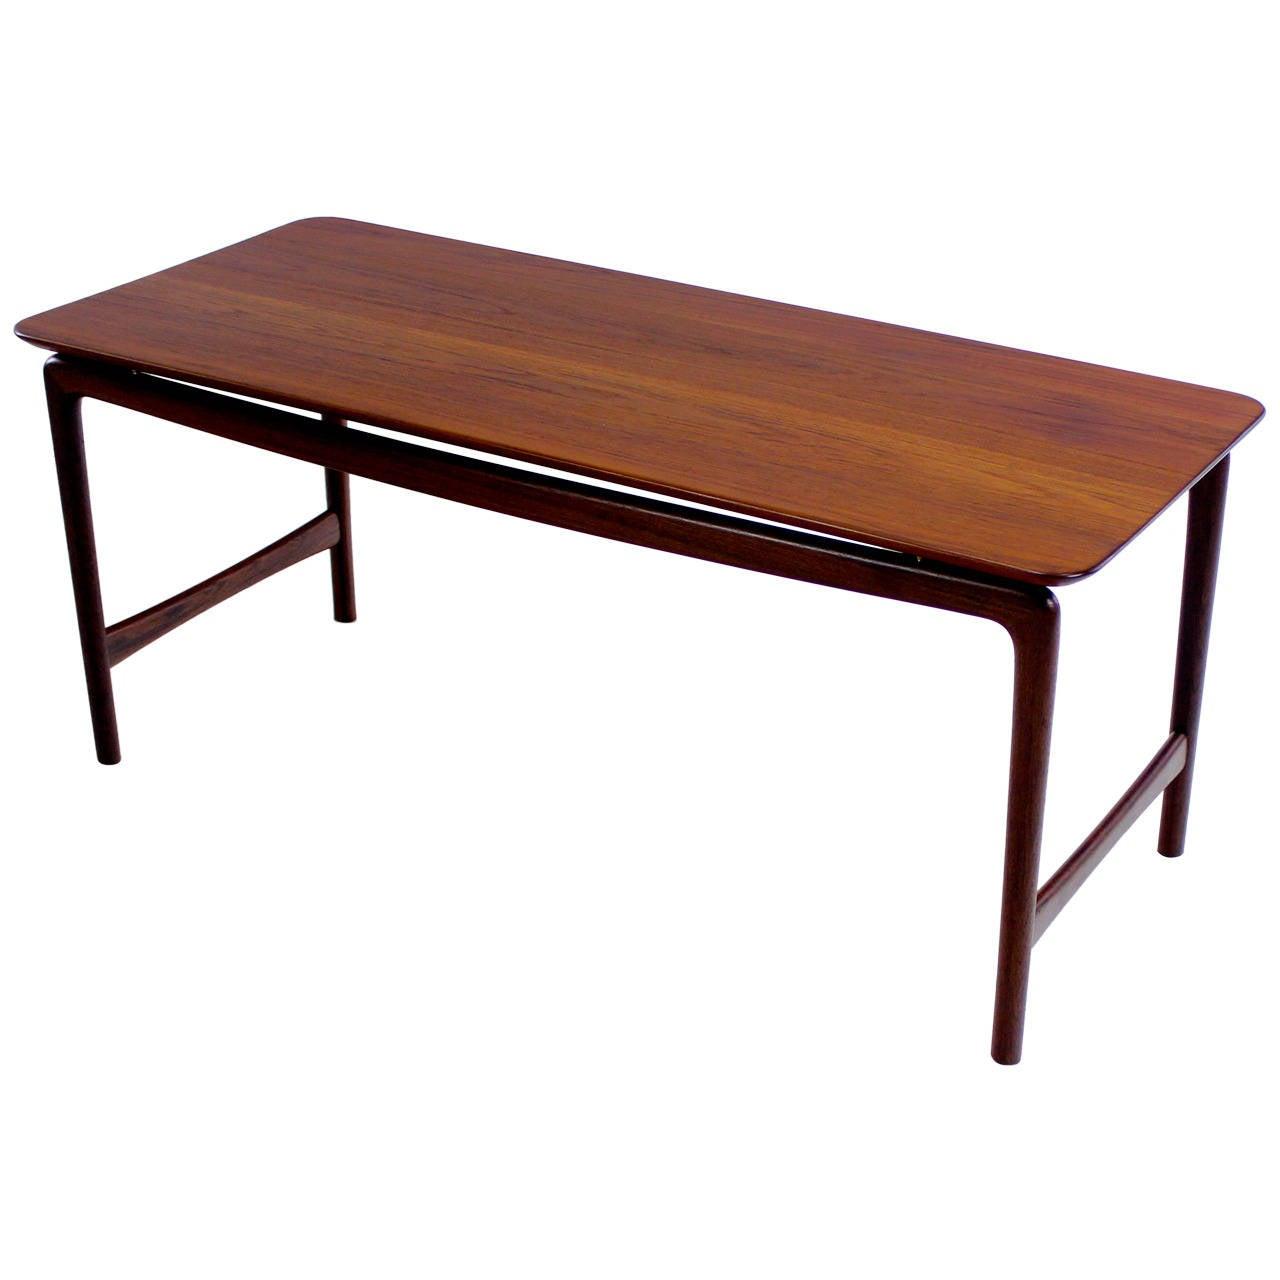 Danish Modern Teak Coffee Table Designed By Peter Hvidt At 1stdibs